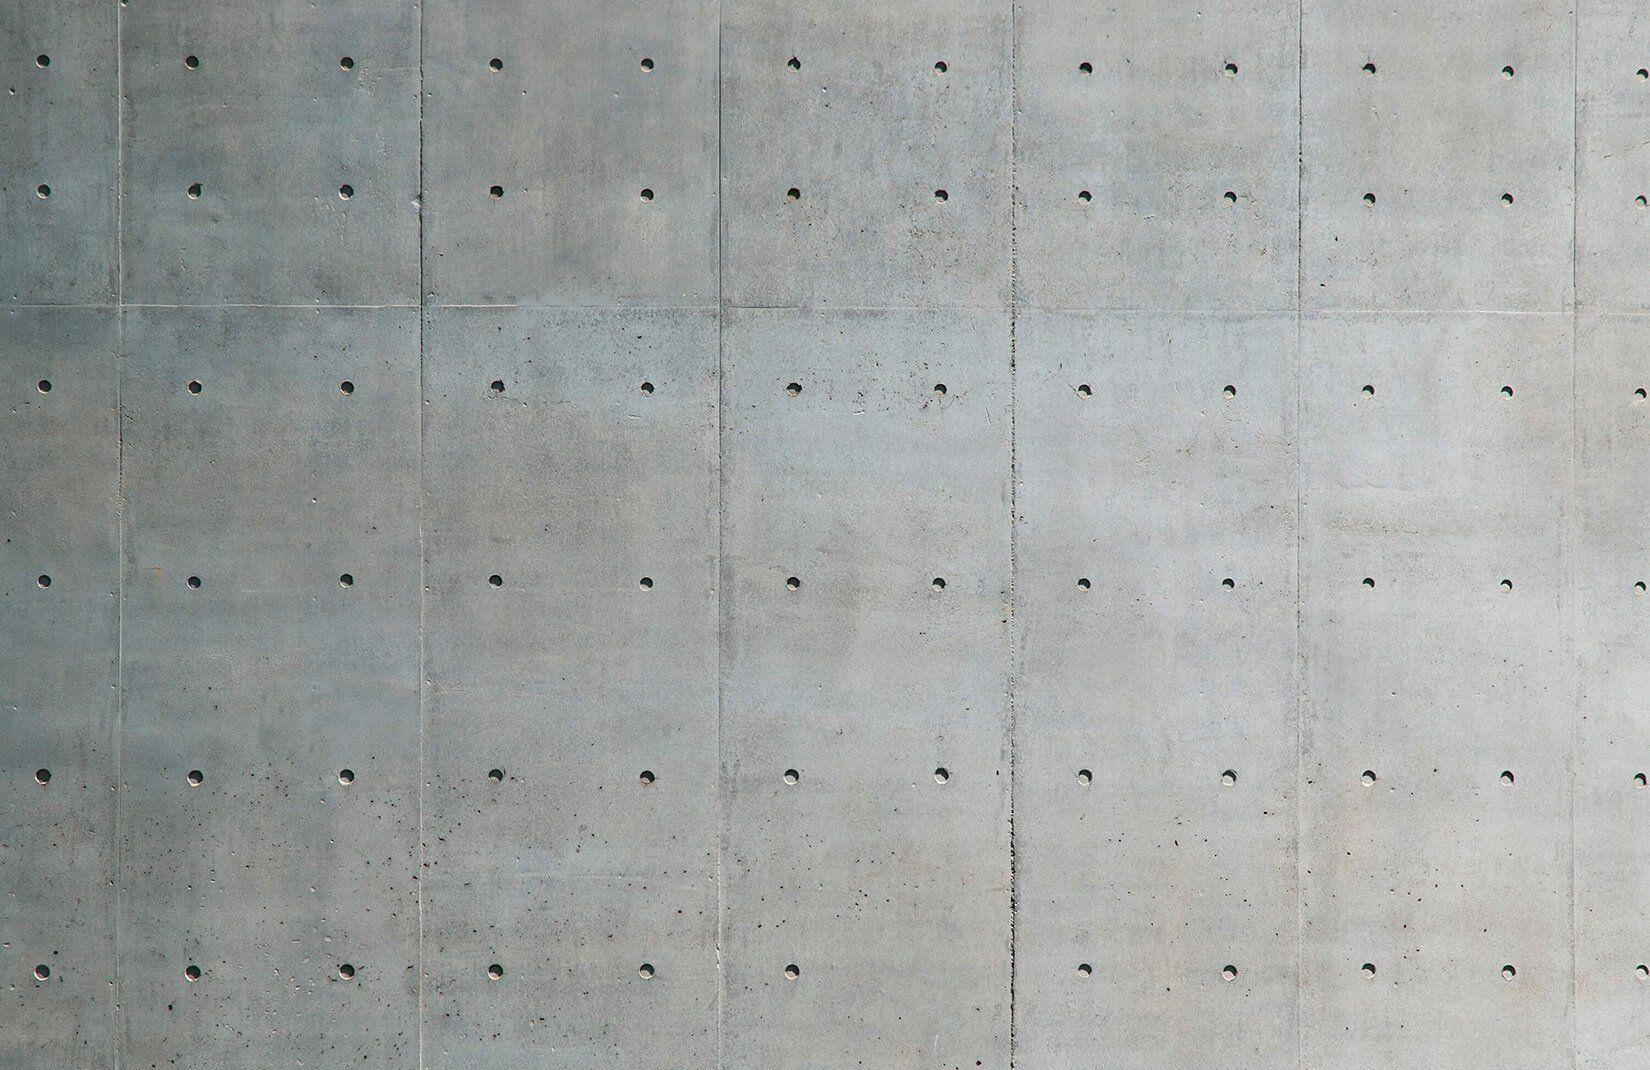 Bare Concrete Wallpaper Mural Murals Wallpaper Concrete Wallpaper Concrete Wall Concrete Wall Texture